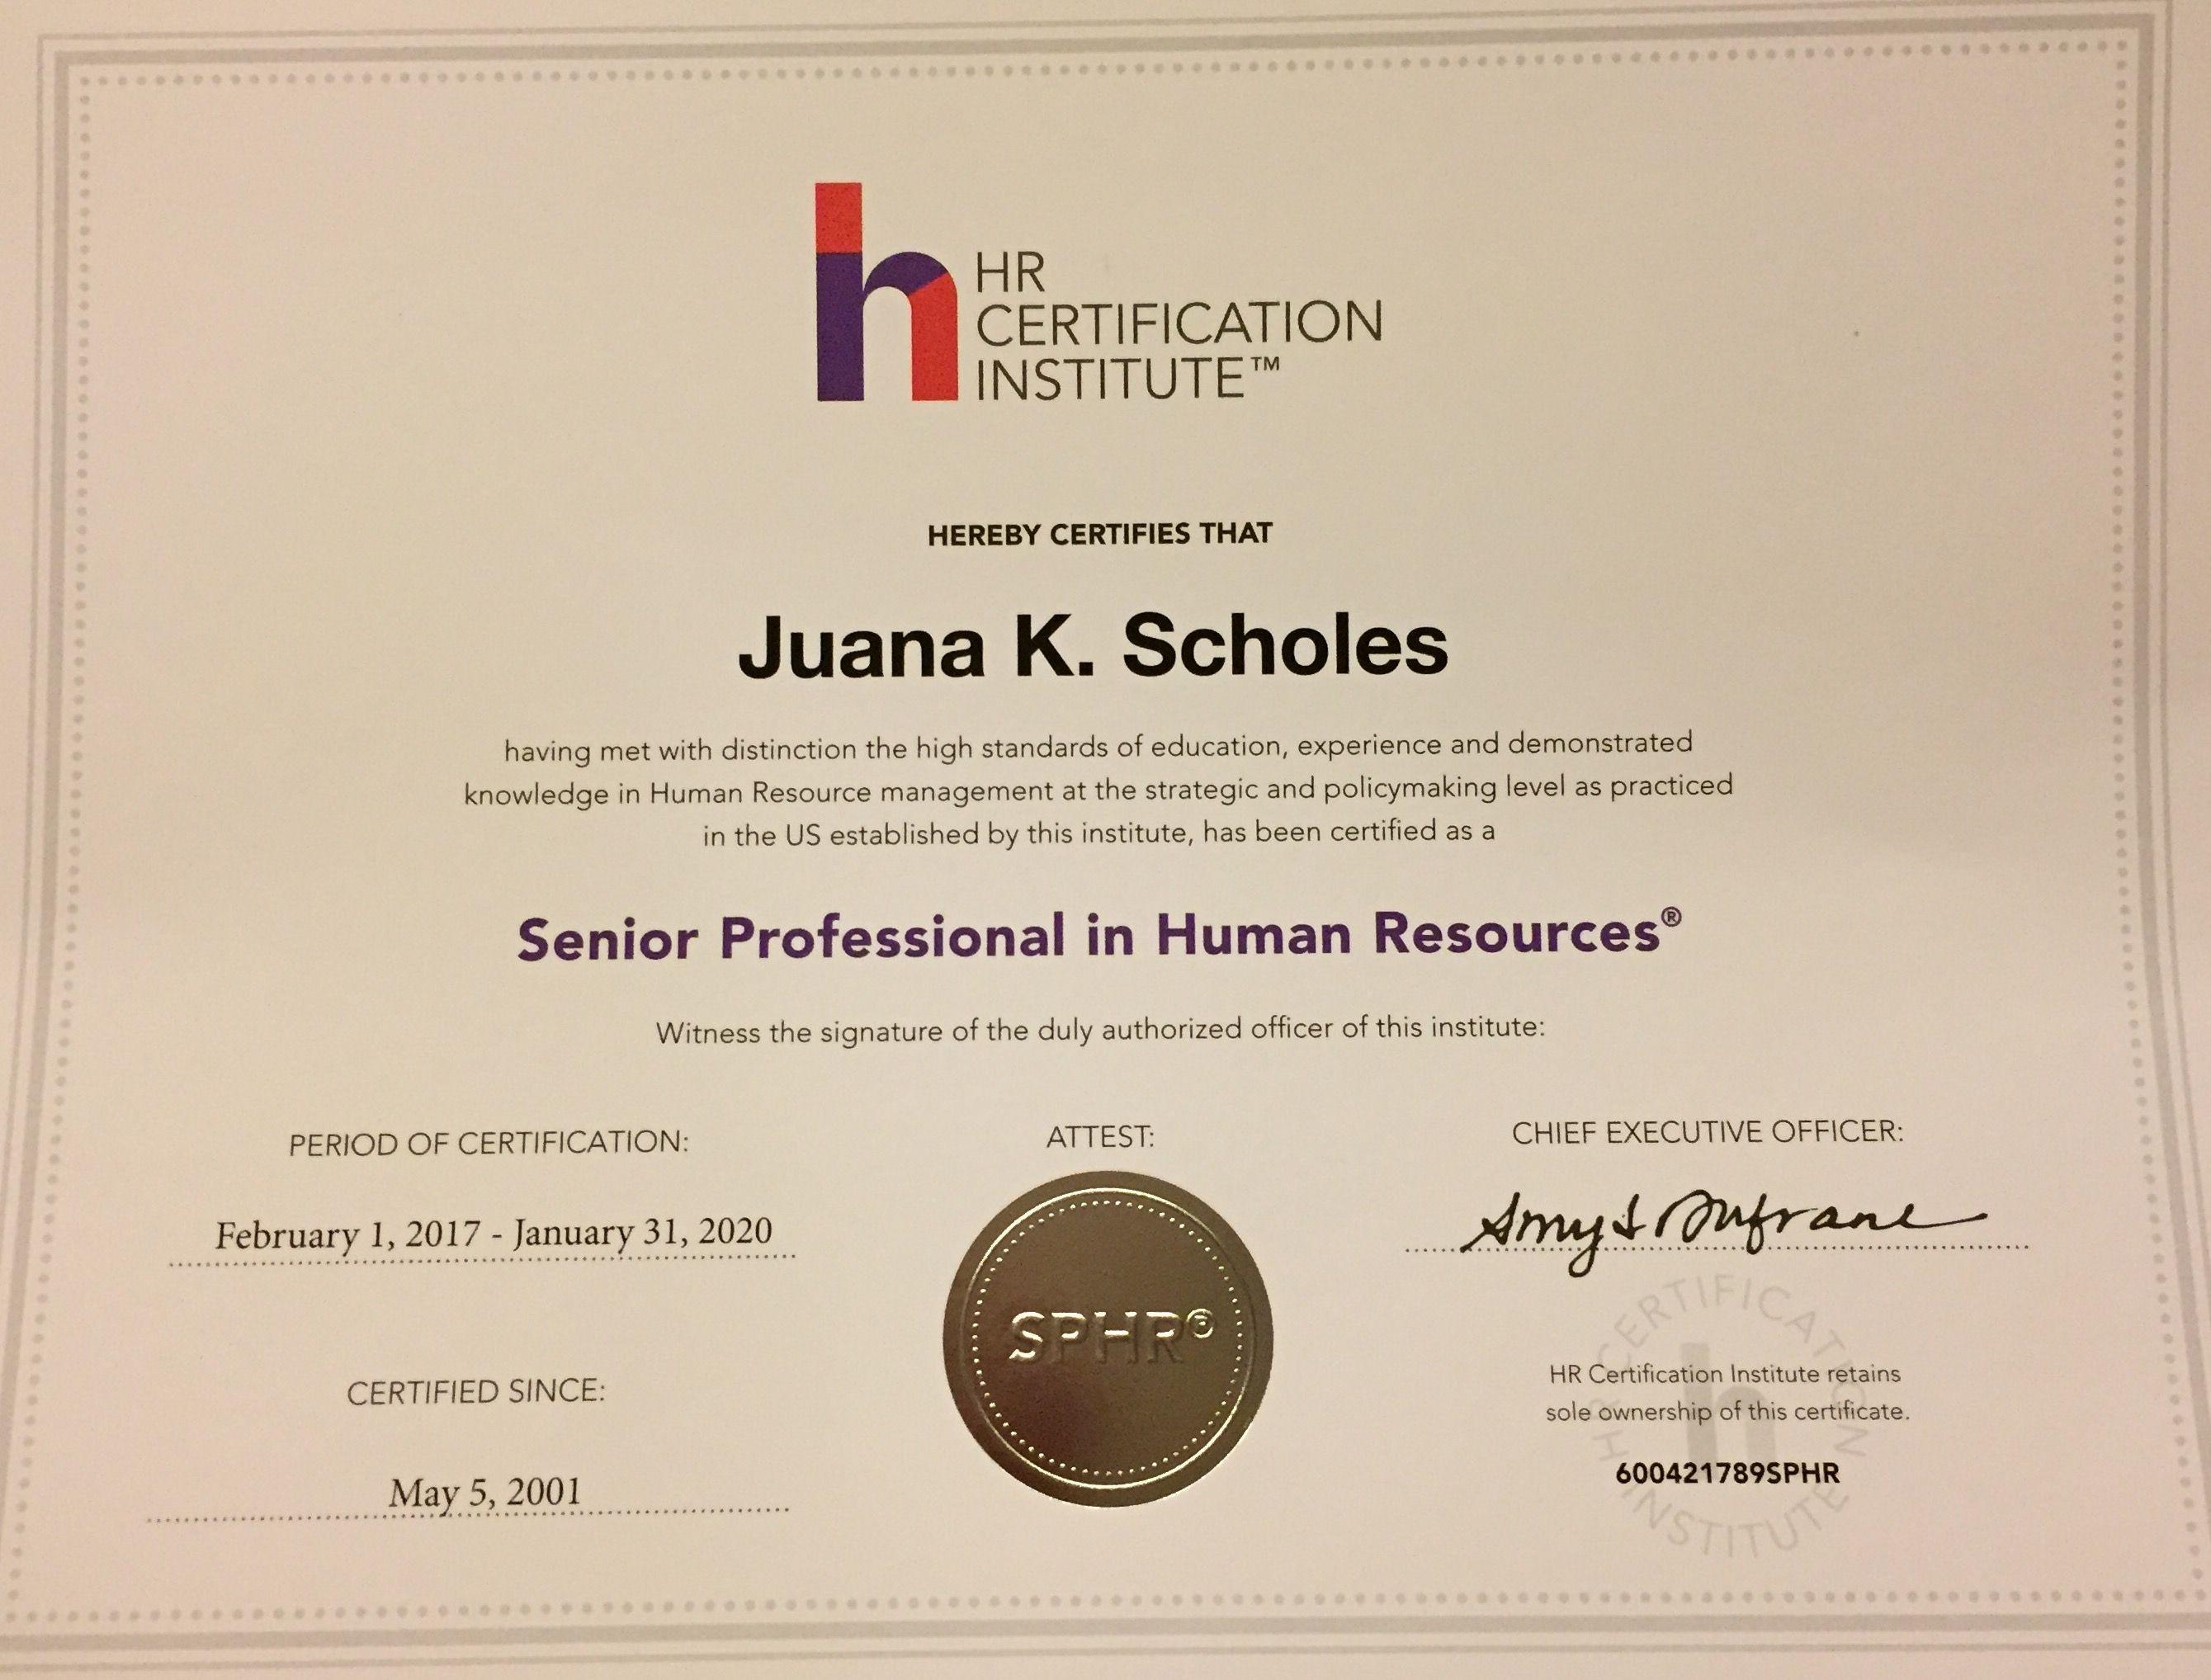 Hrci Sphr Certification Sphr Certification Pinterest